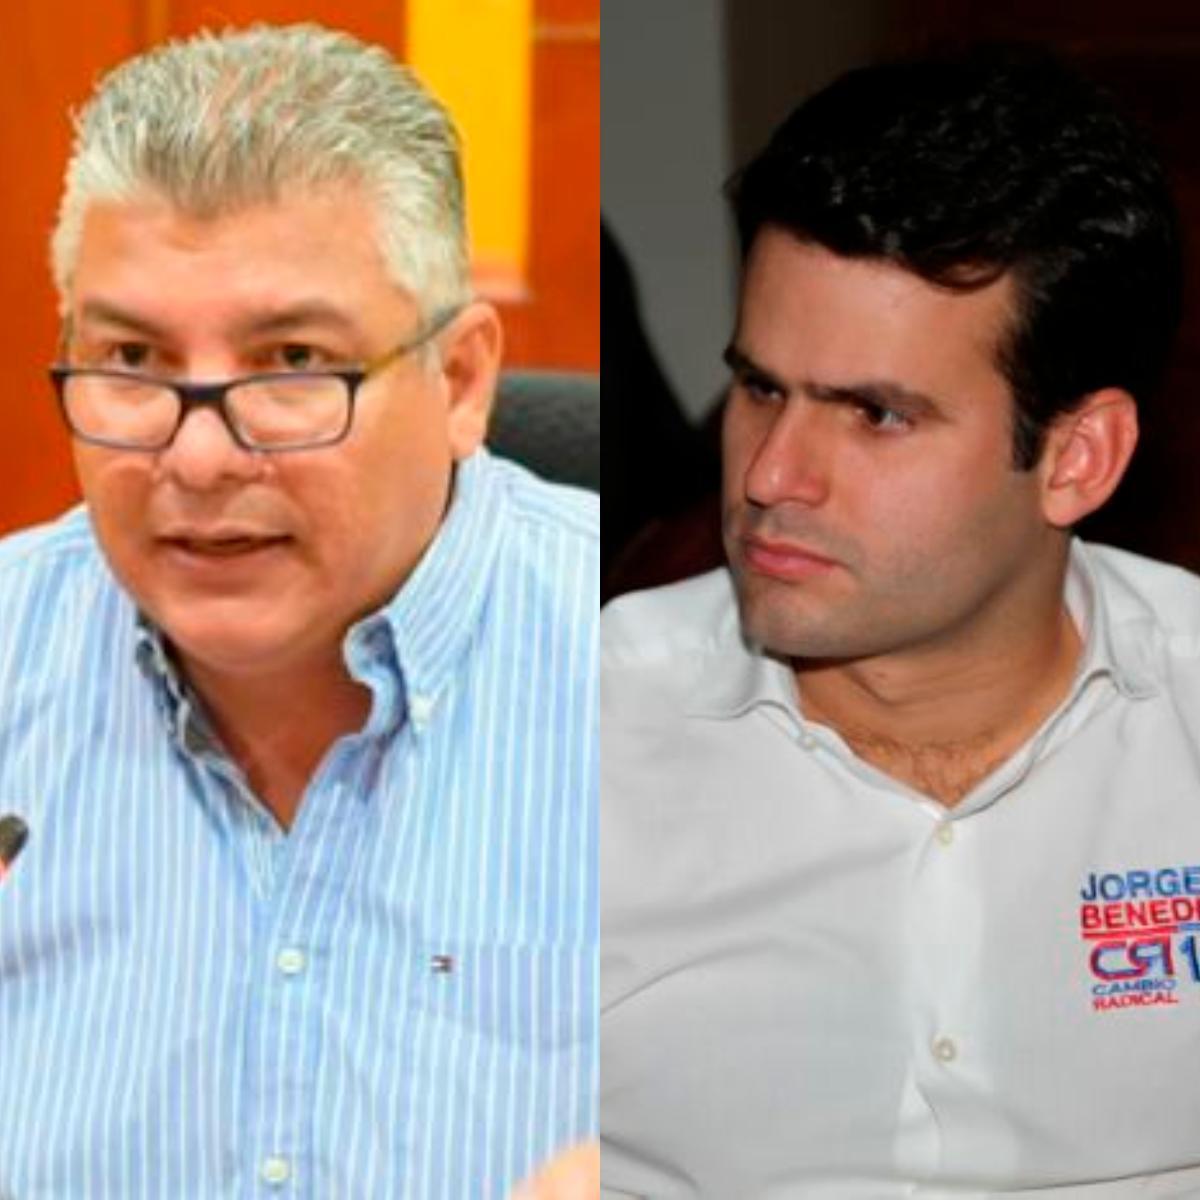 Óscar Marín y Jorge Benedetti. // El Universal